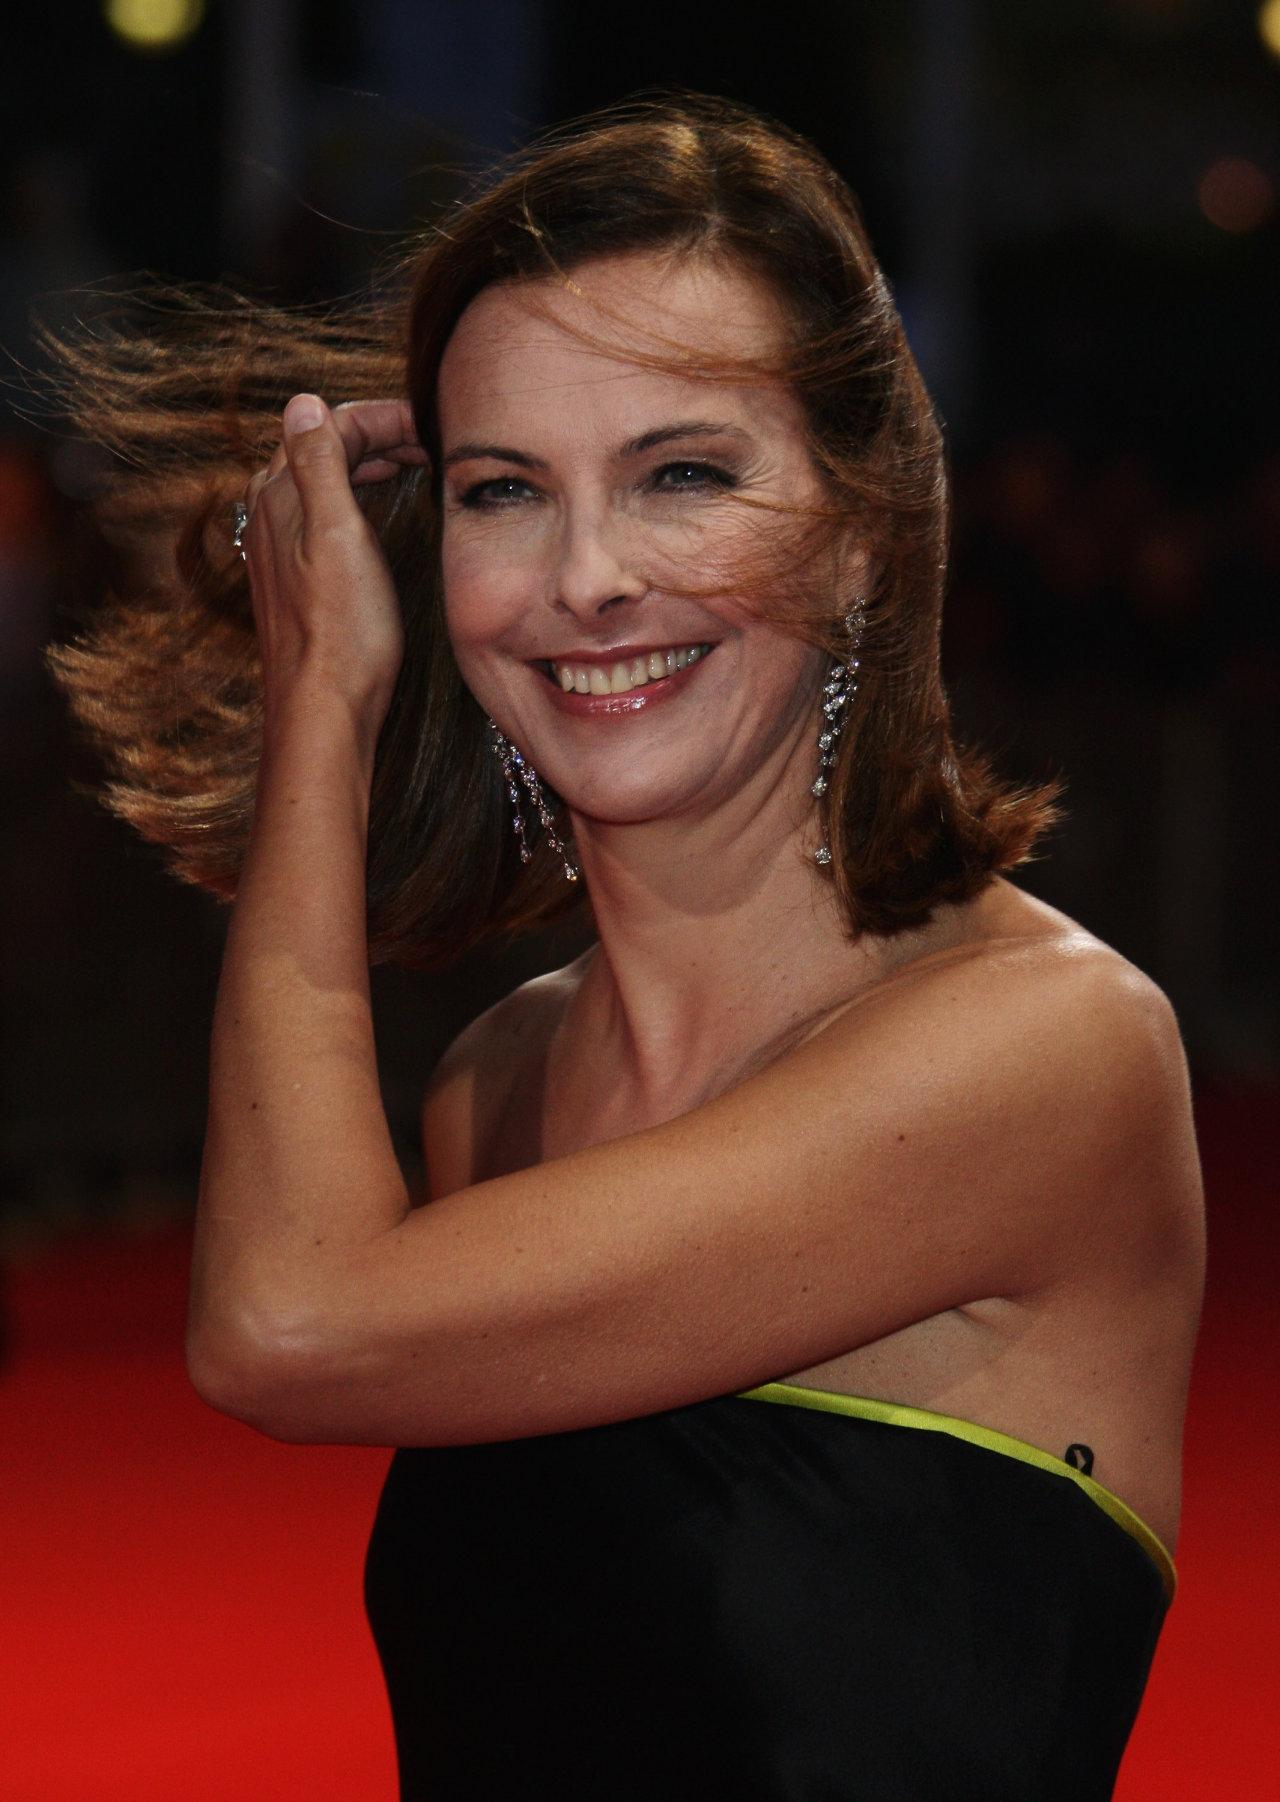 Carole Bouquet Net Worth